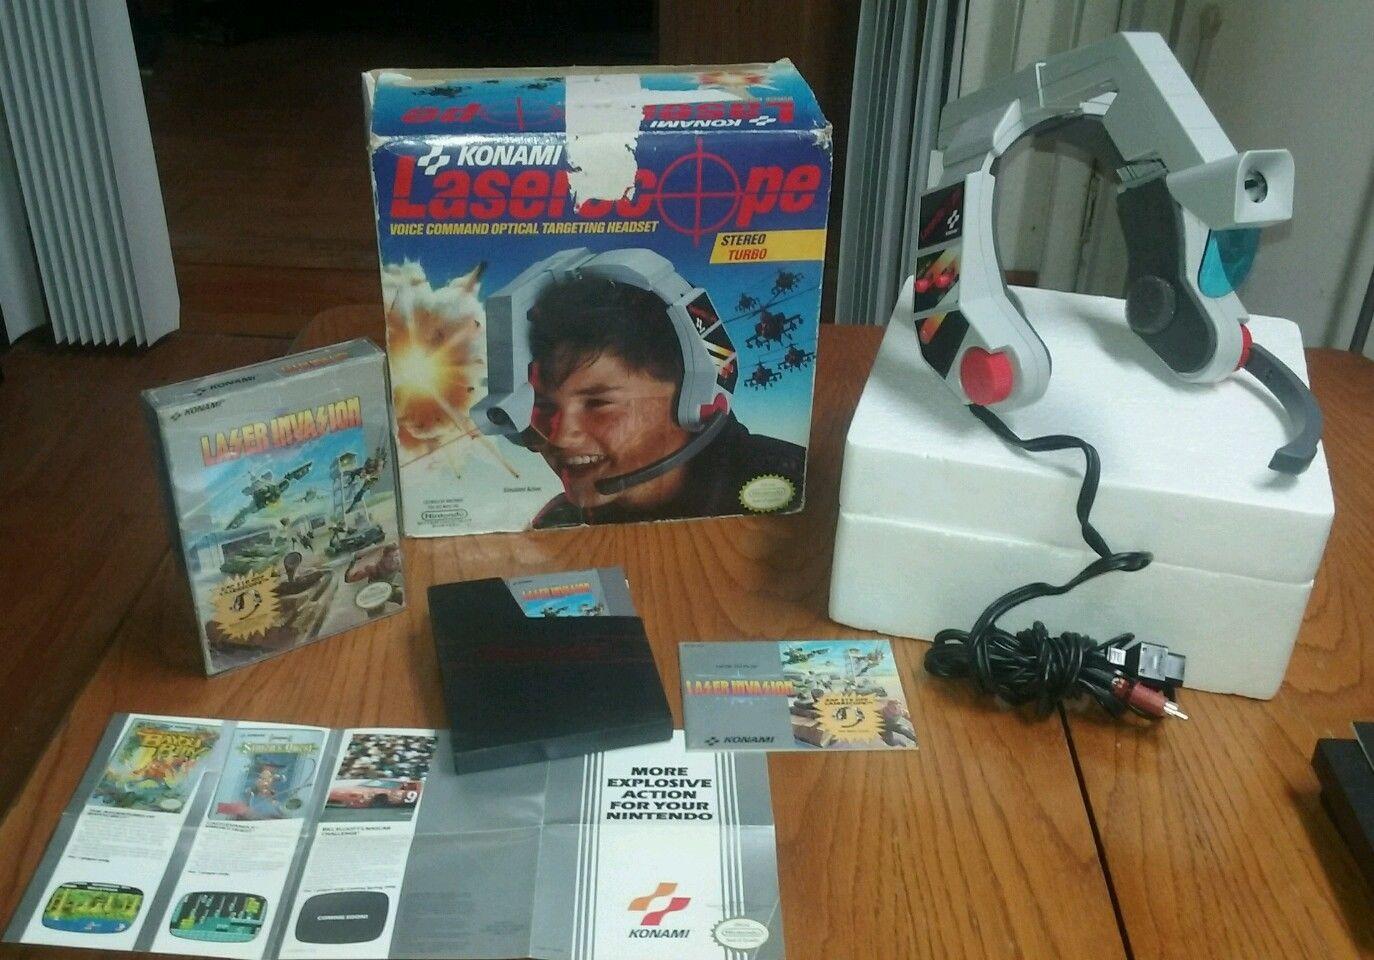 Laser Scope Skirtas Nintendo Entertainment System